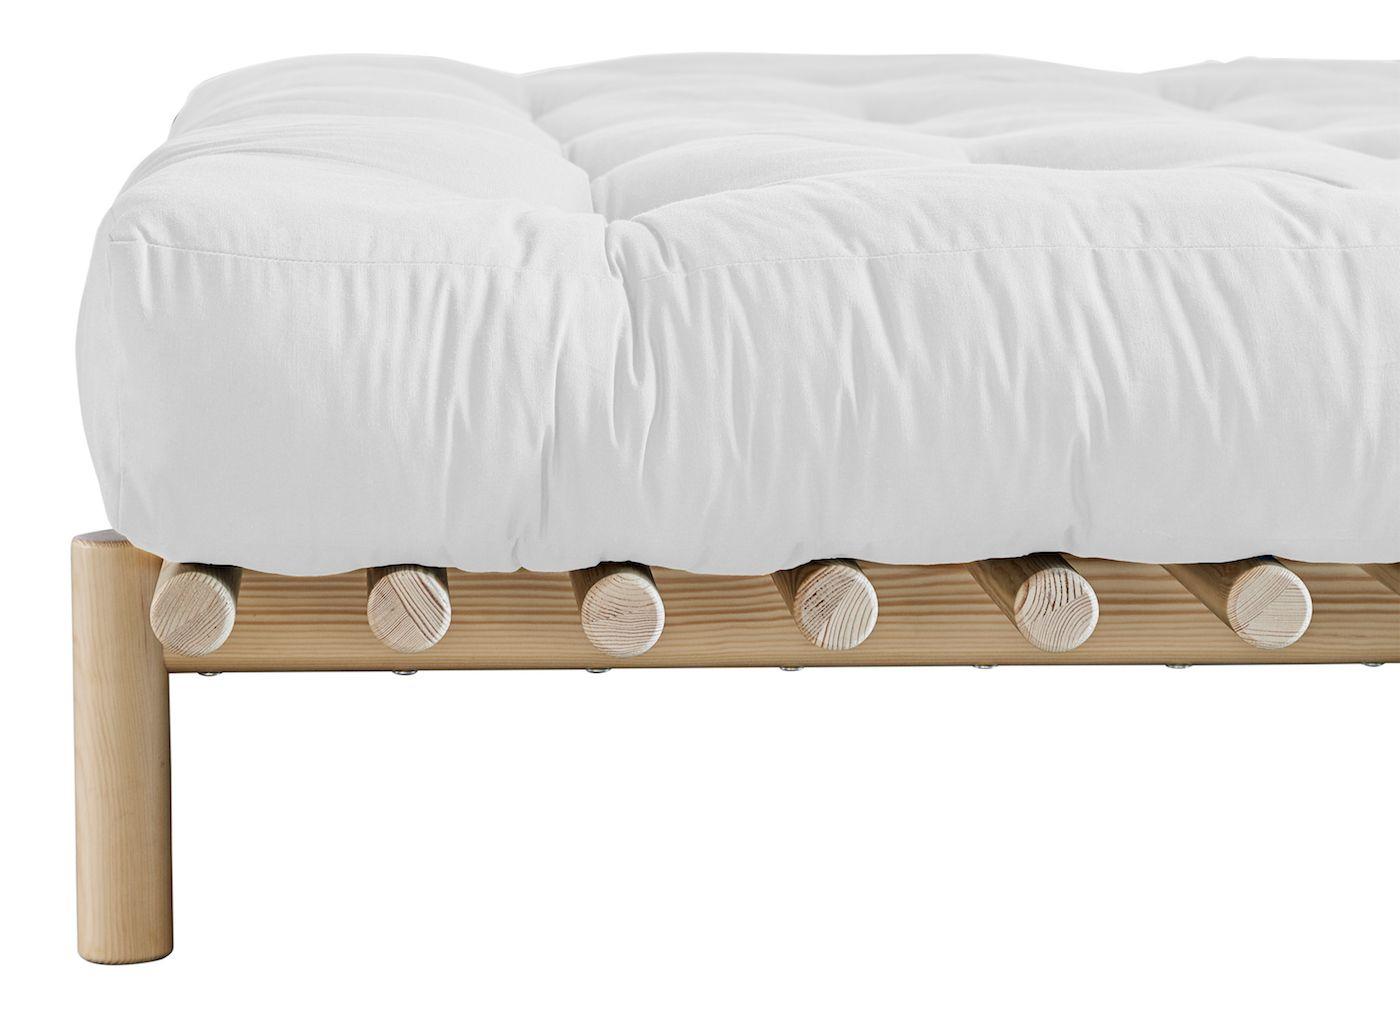 Comfort madras 140 cm - Natur - Hvit futon madrass